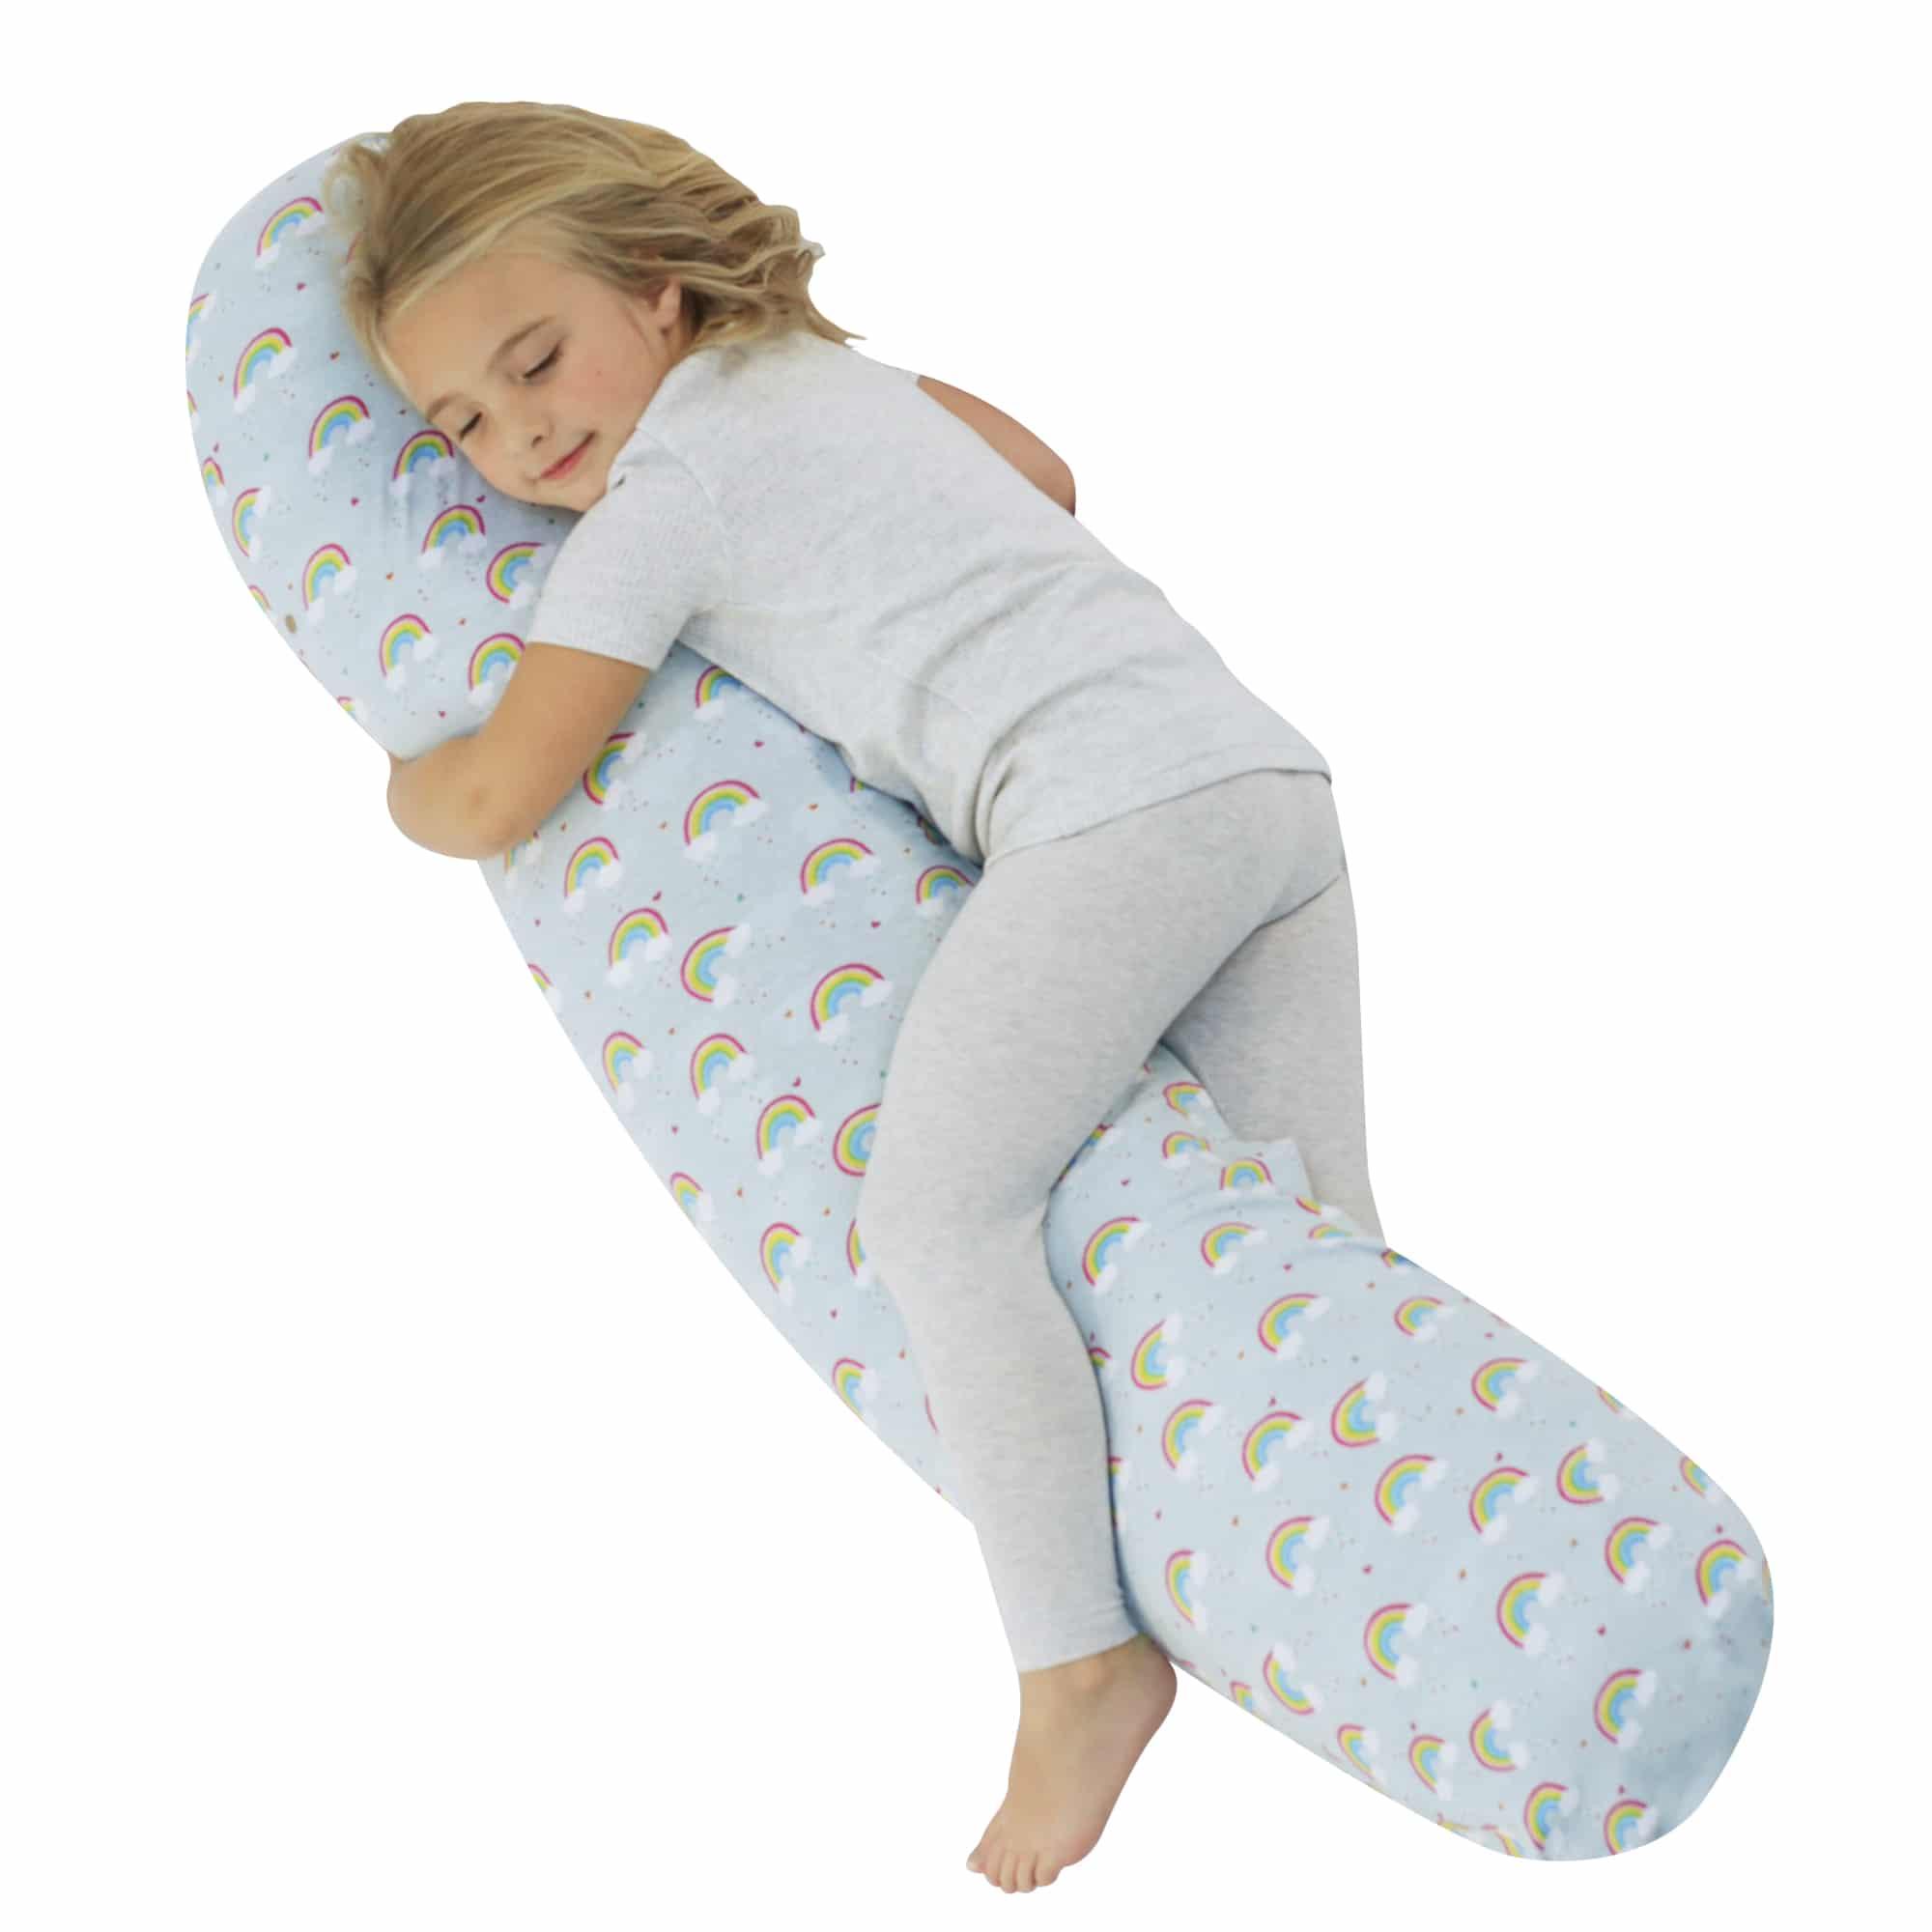 Kally Kids Pillow – Over The Rainbow